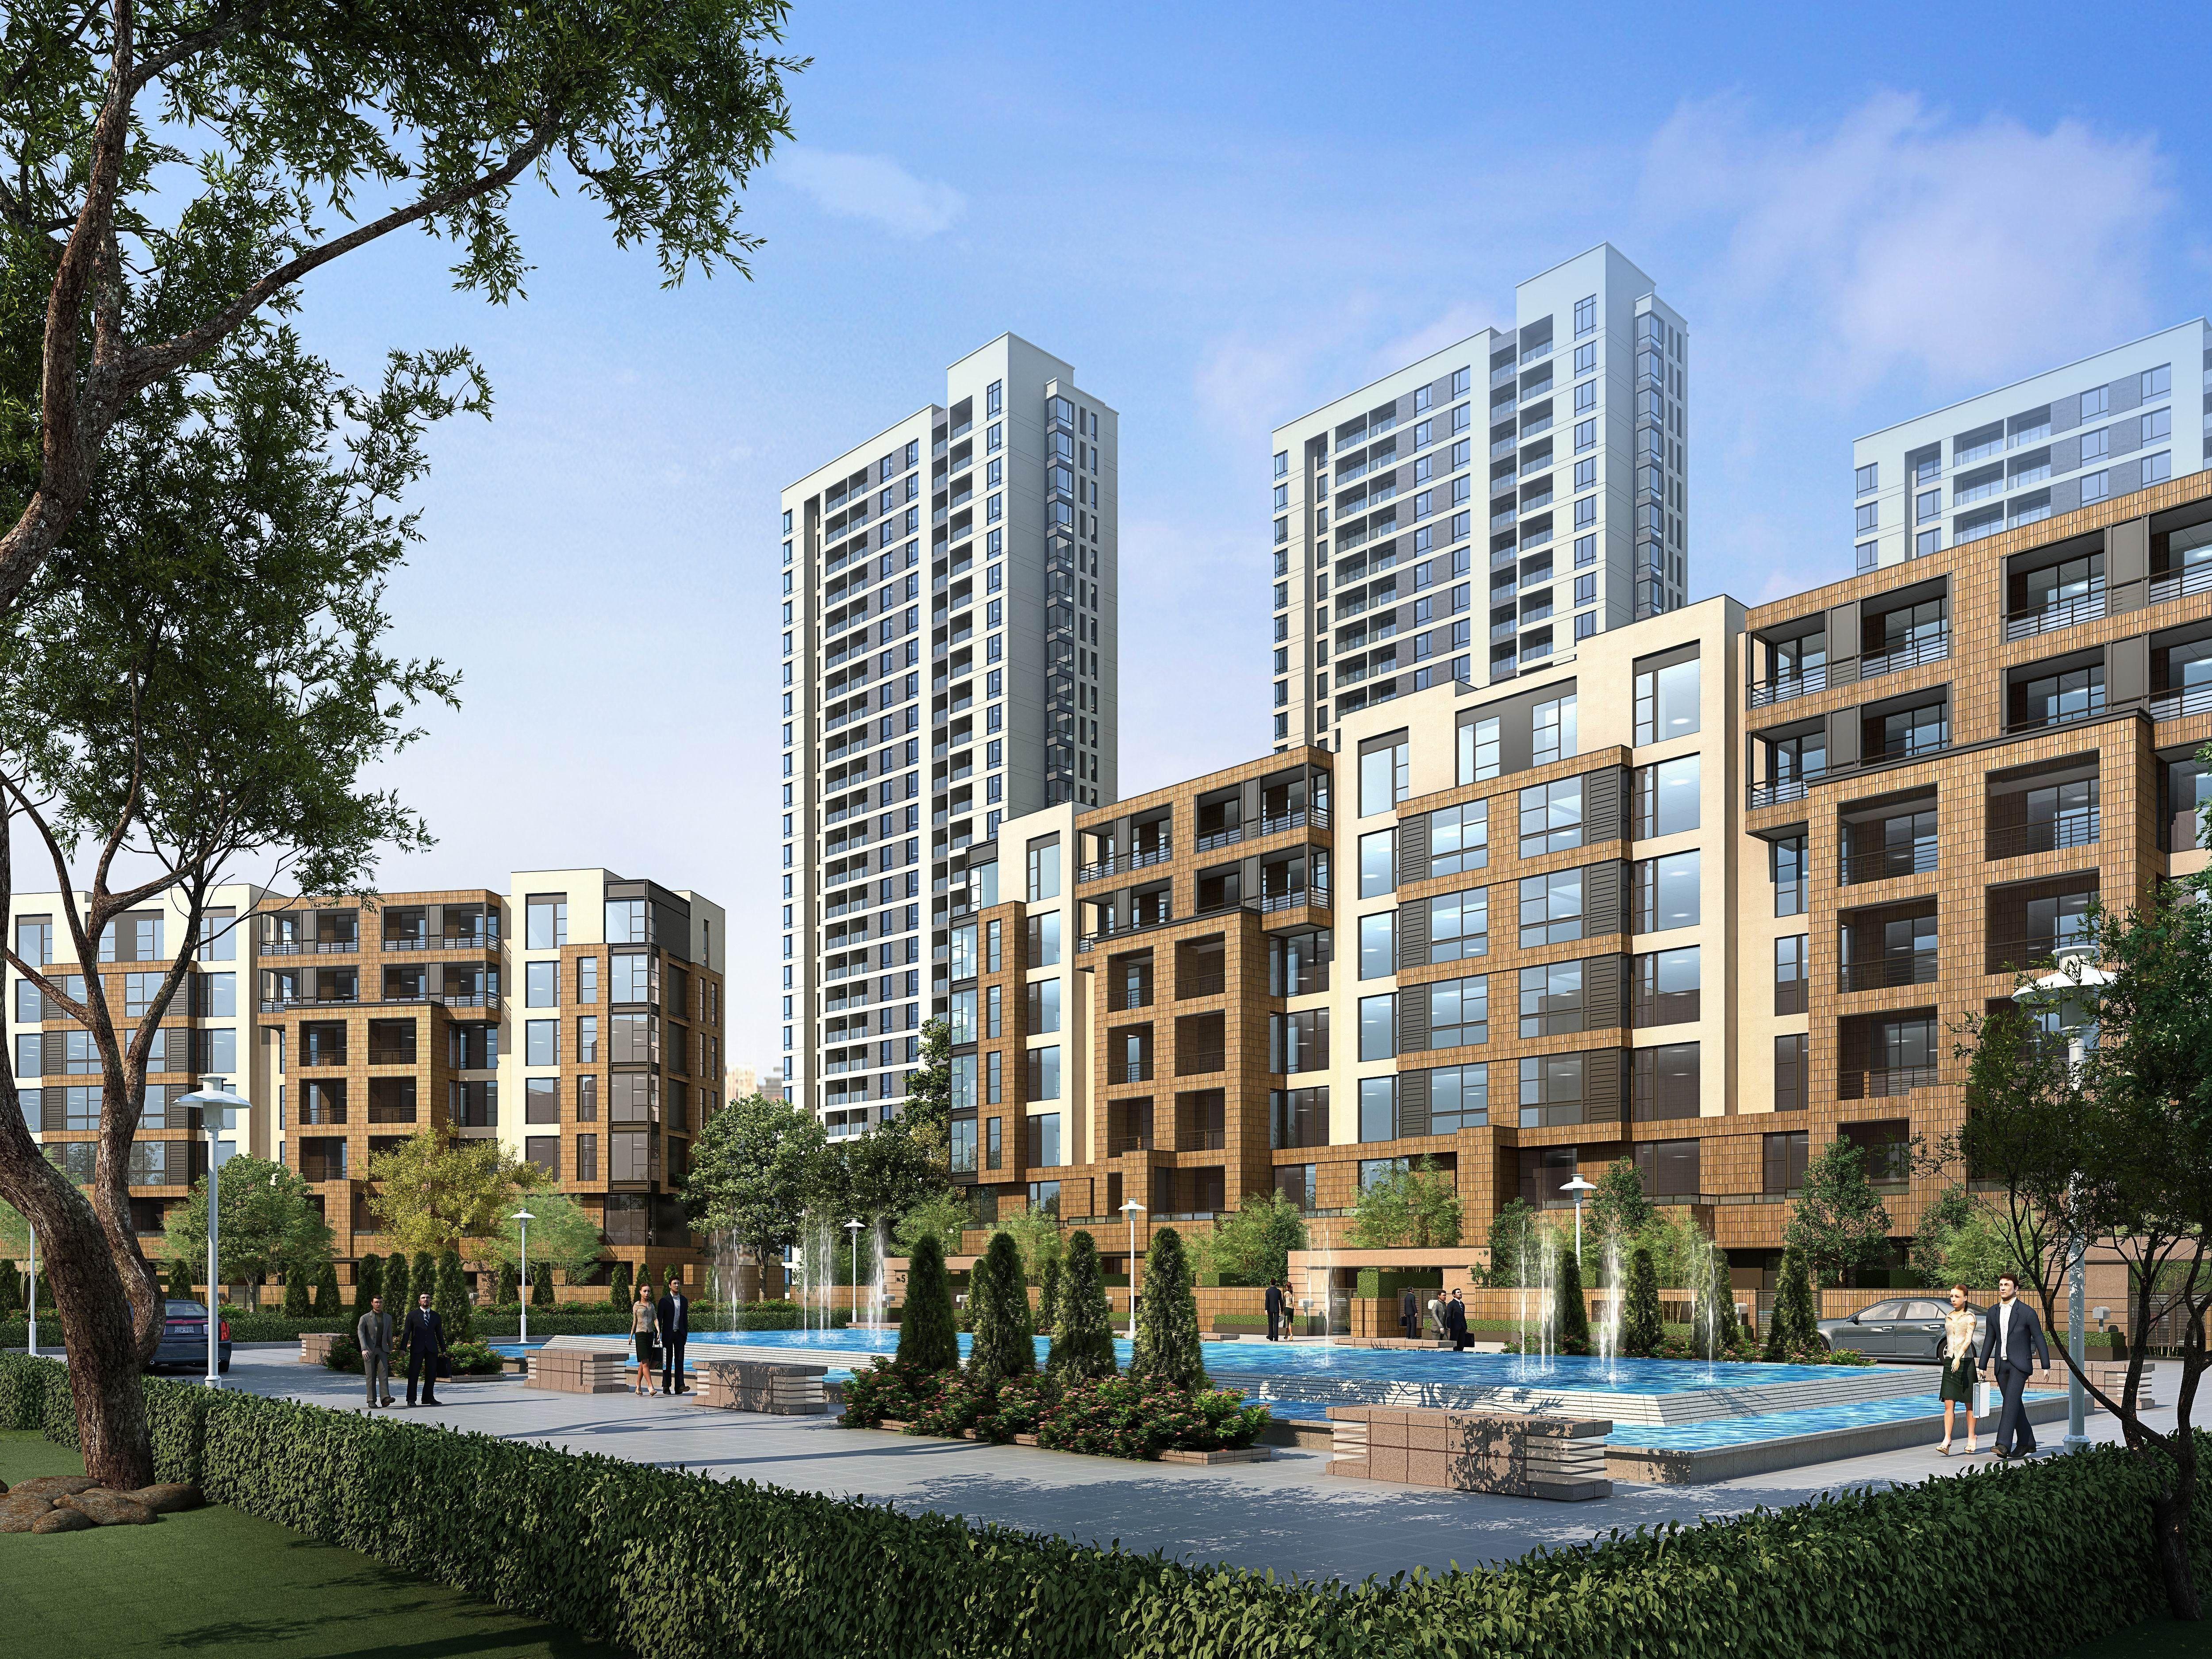 City Commercial And Residential Building Design 002 3d Model Max Obj Mtl Tga 1